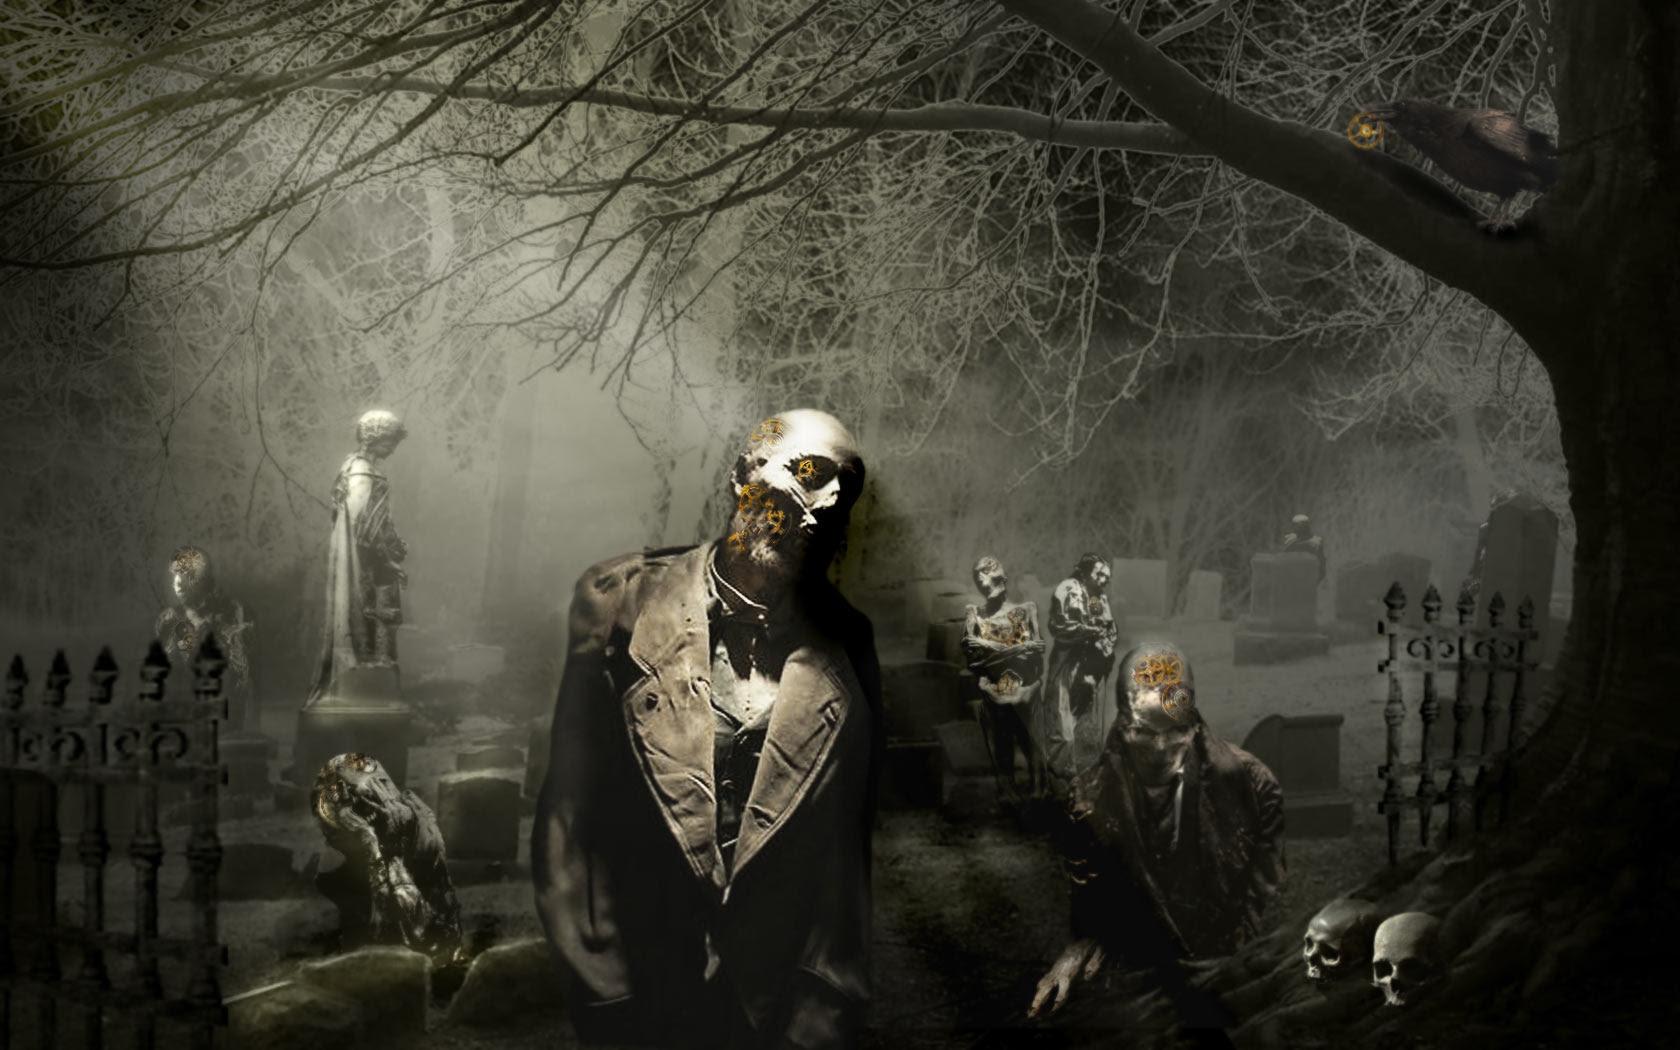 Kumpulan Wallpaper De Zombies Hd